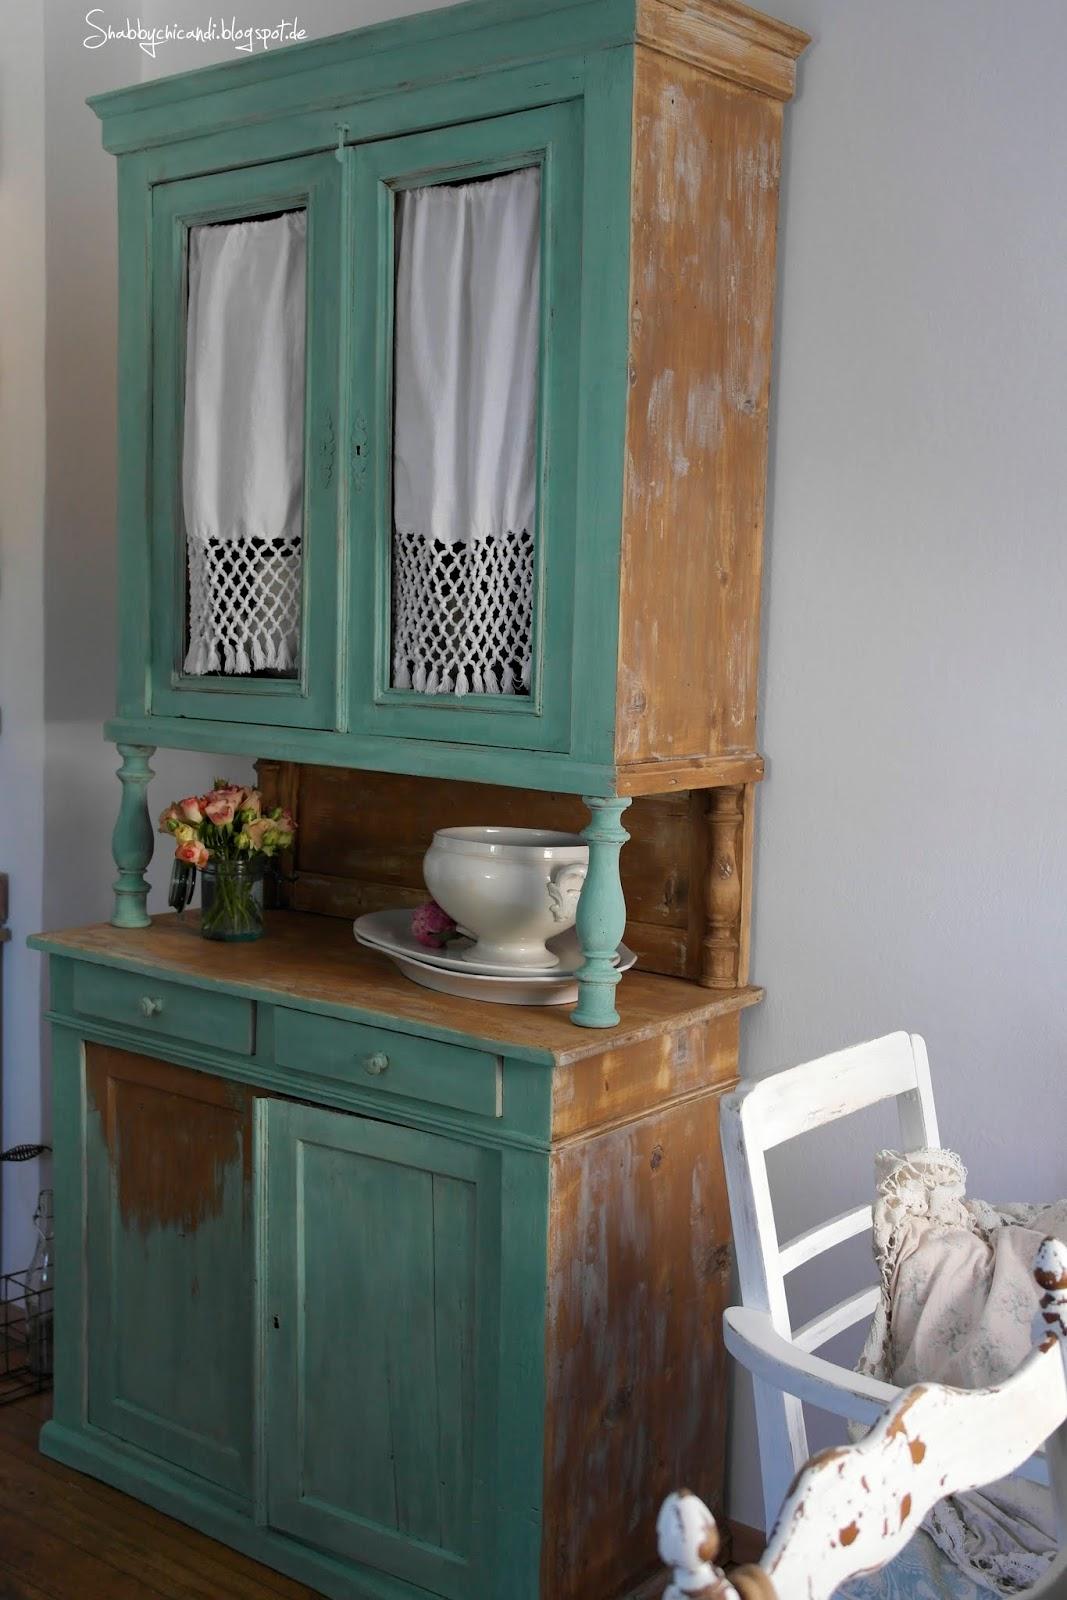 kinderzimmer kreative ideen. Black Bedroom Furniture Sets. Home Design Ideas